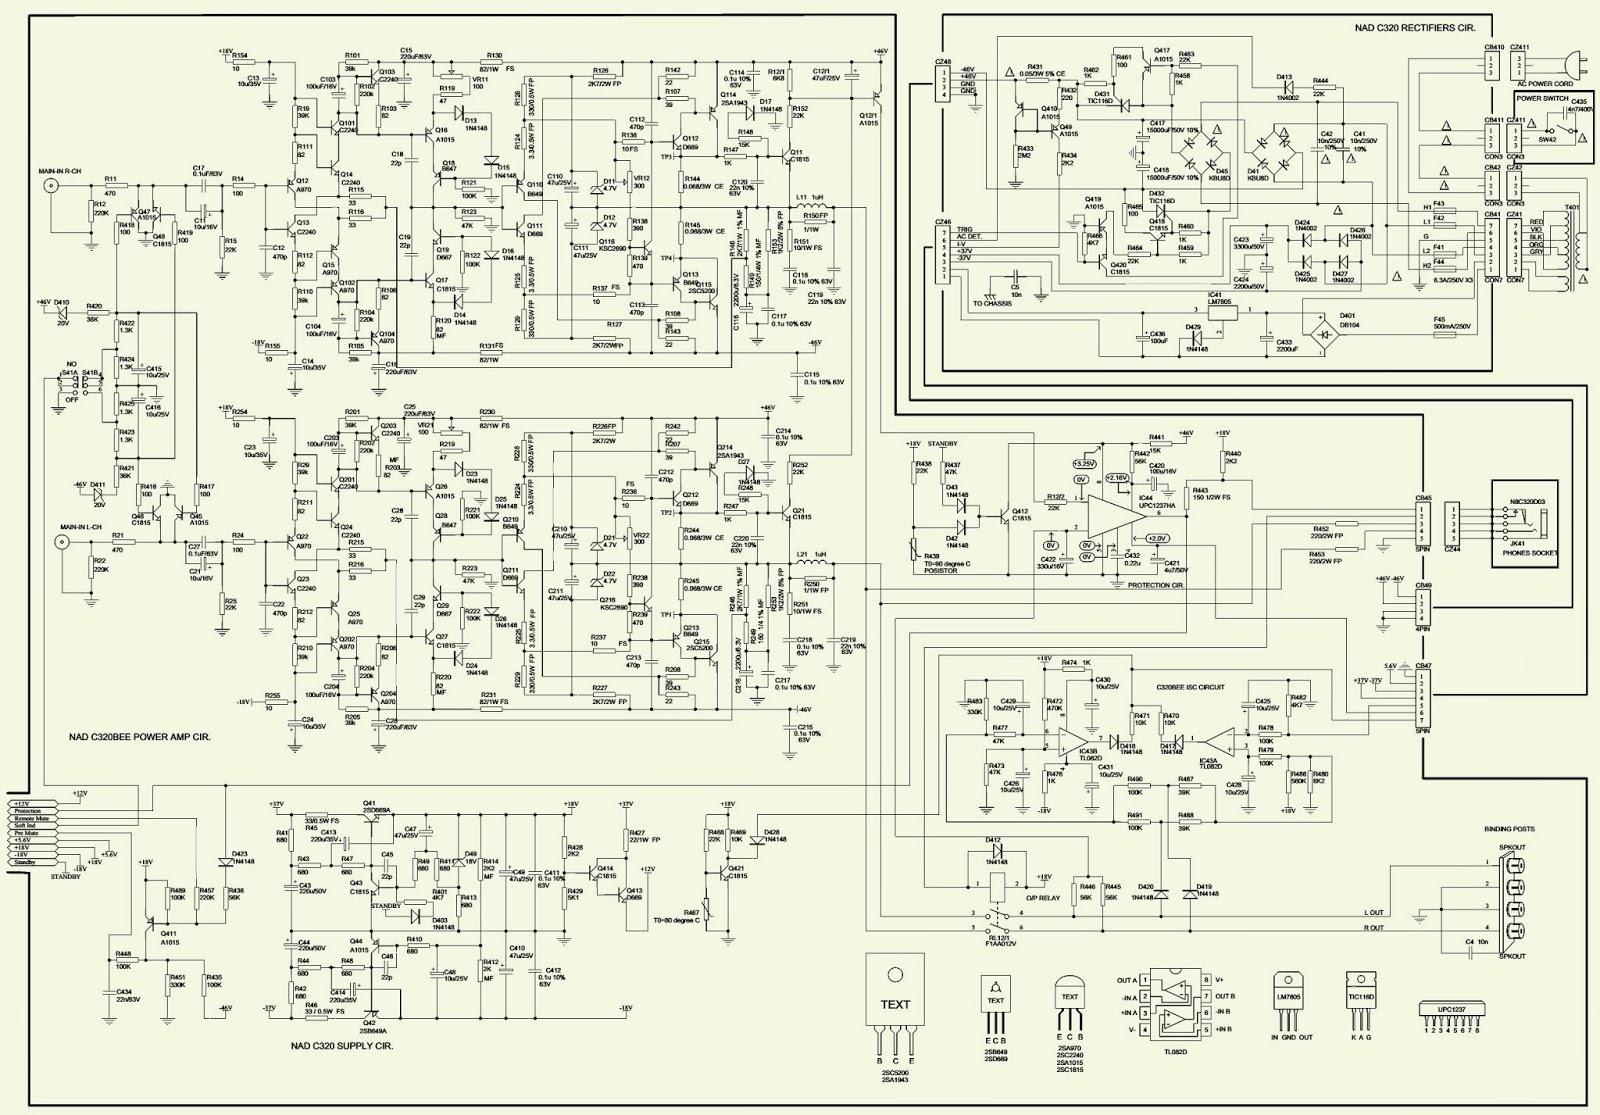 nad c 320bee stereo amp schematic circuit diagram electro help rh electronicshelponline blogspot com nad c320 user manual nad c320bee user manual